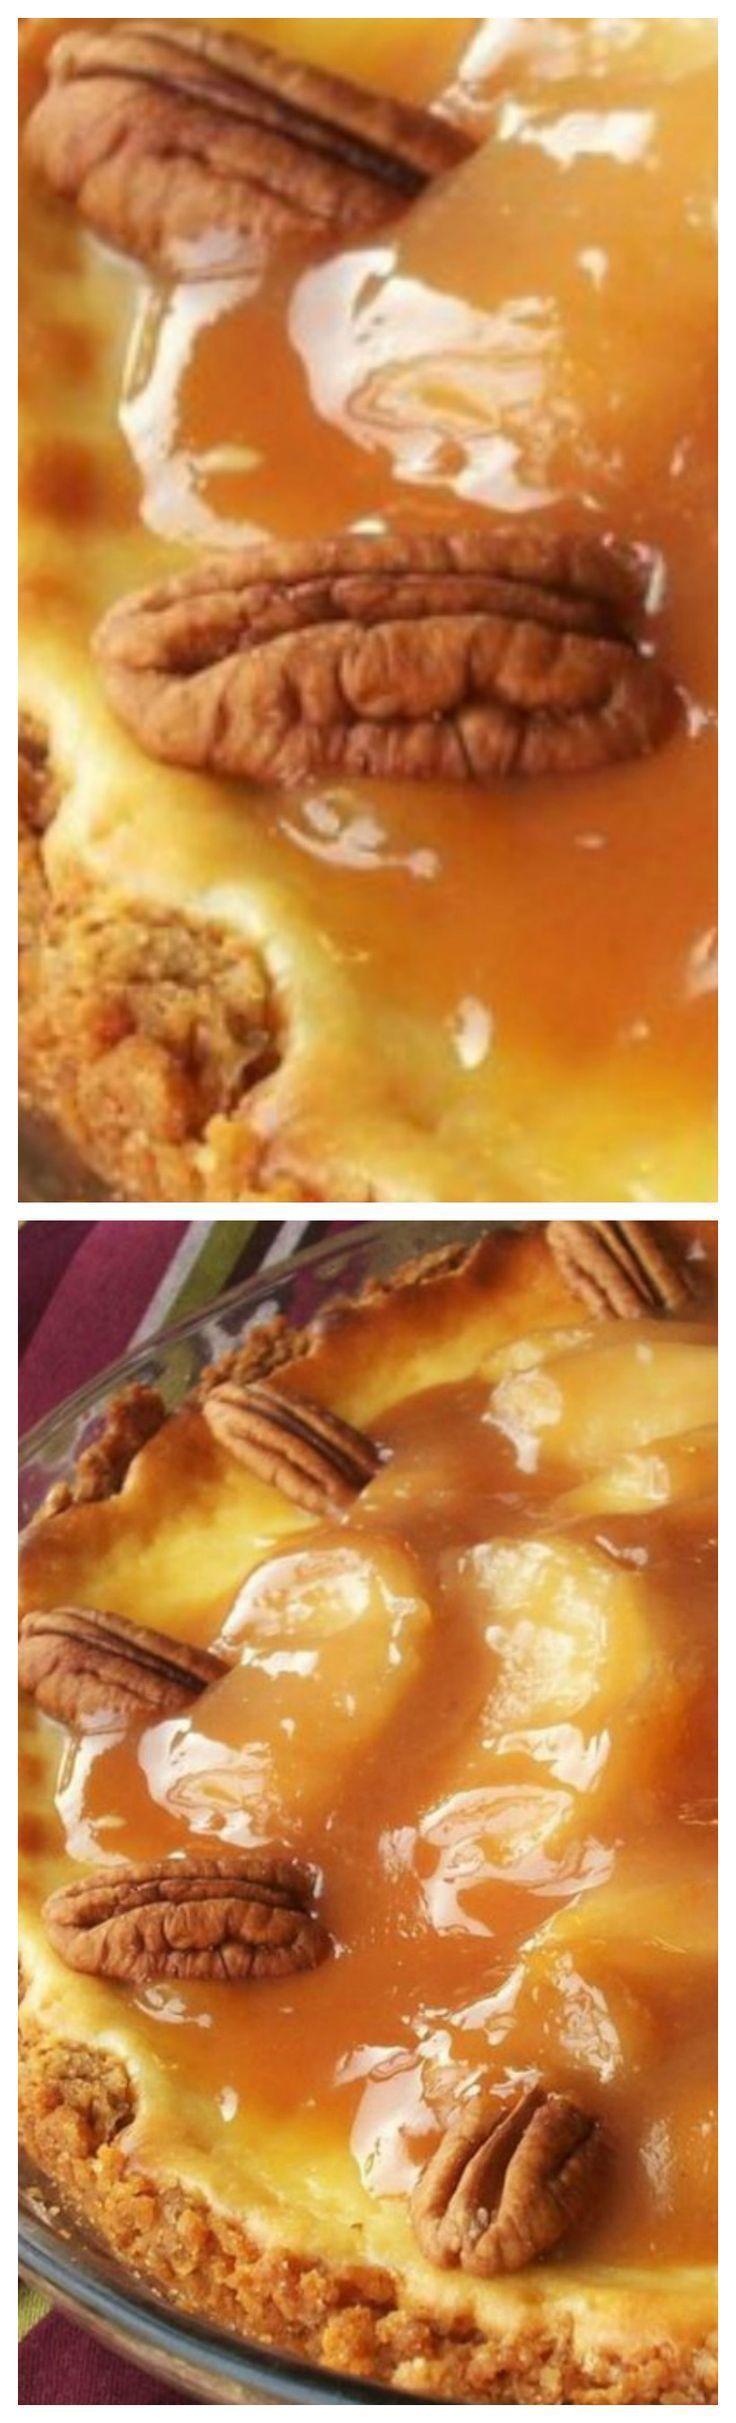 Caramel Apple Cheesecake Recipe #caramelapplecheesecake Caramel Apple Cheesecake Recipe #caramelapplecheesecake Caramel Apple Cheesecake Recipe #caramelapplecheesecake Caramel Apple Cheesecake Recipe #caramelapplecheesecake Caramel Apple Cheesecake Recipe #caramelapplecheesecake Caramel Apple Cheesecake Recipe #caramelapplecheesecake Caramel Apple Cheesecake Recipe #caramelapplecheesecake Caramel Apple Cheesecake Recipe #caramelapplecheesecake Caramel Apple Cheesecake Recipe #caramelapplecheesec #caramelapplecheesecake